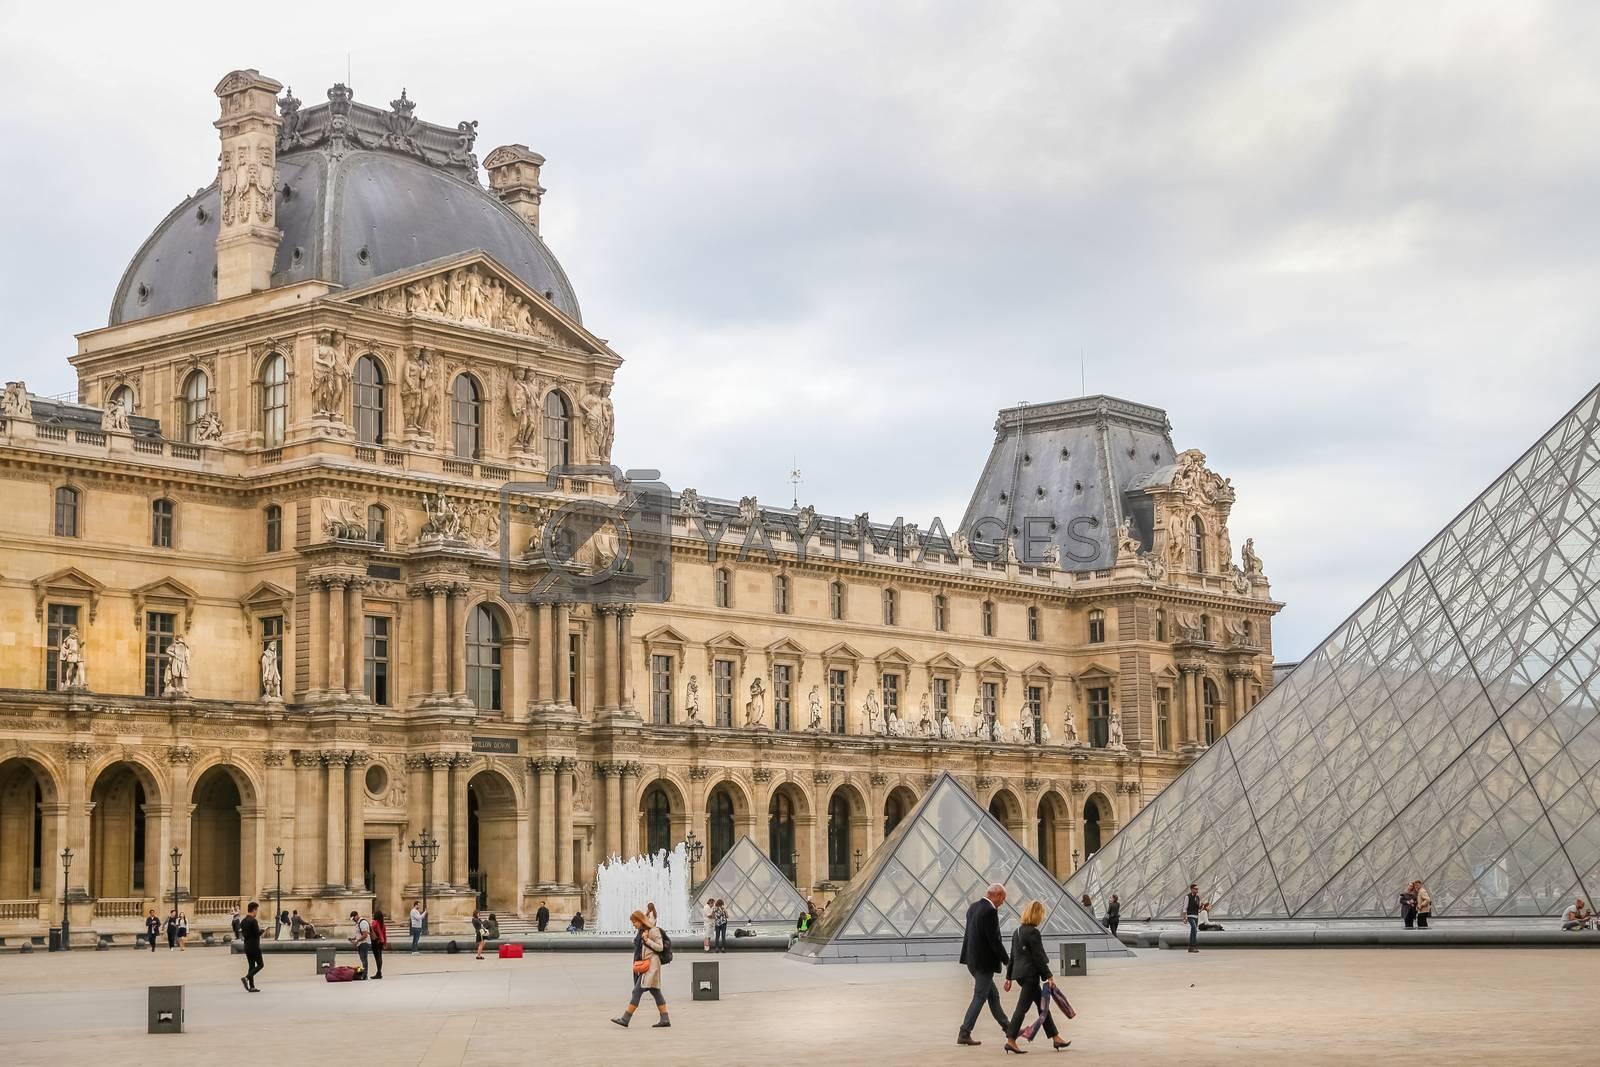 Louvre Museum in Paris City by EvrenKalinbacak